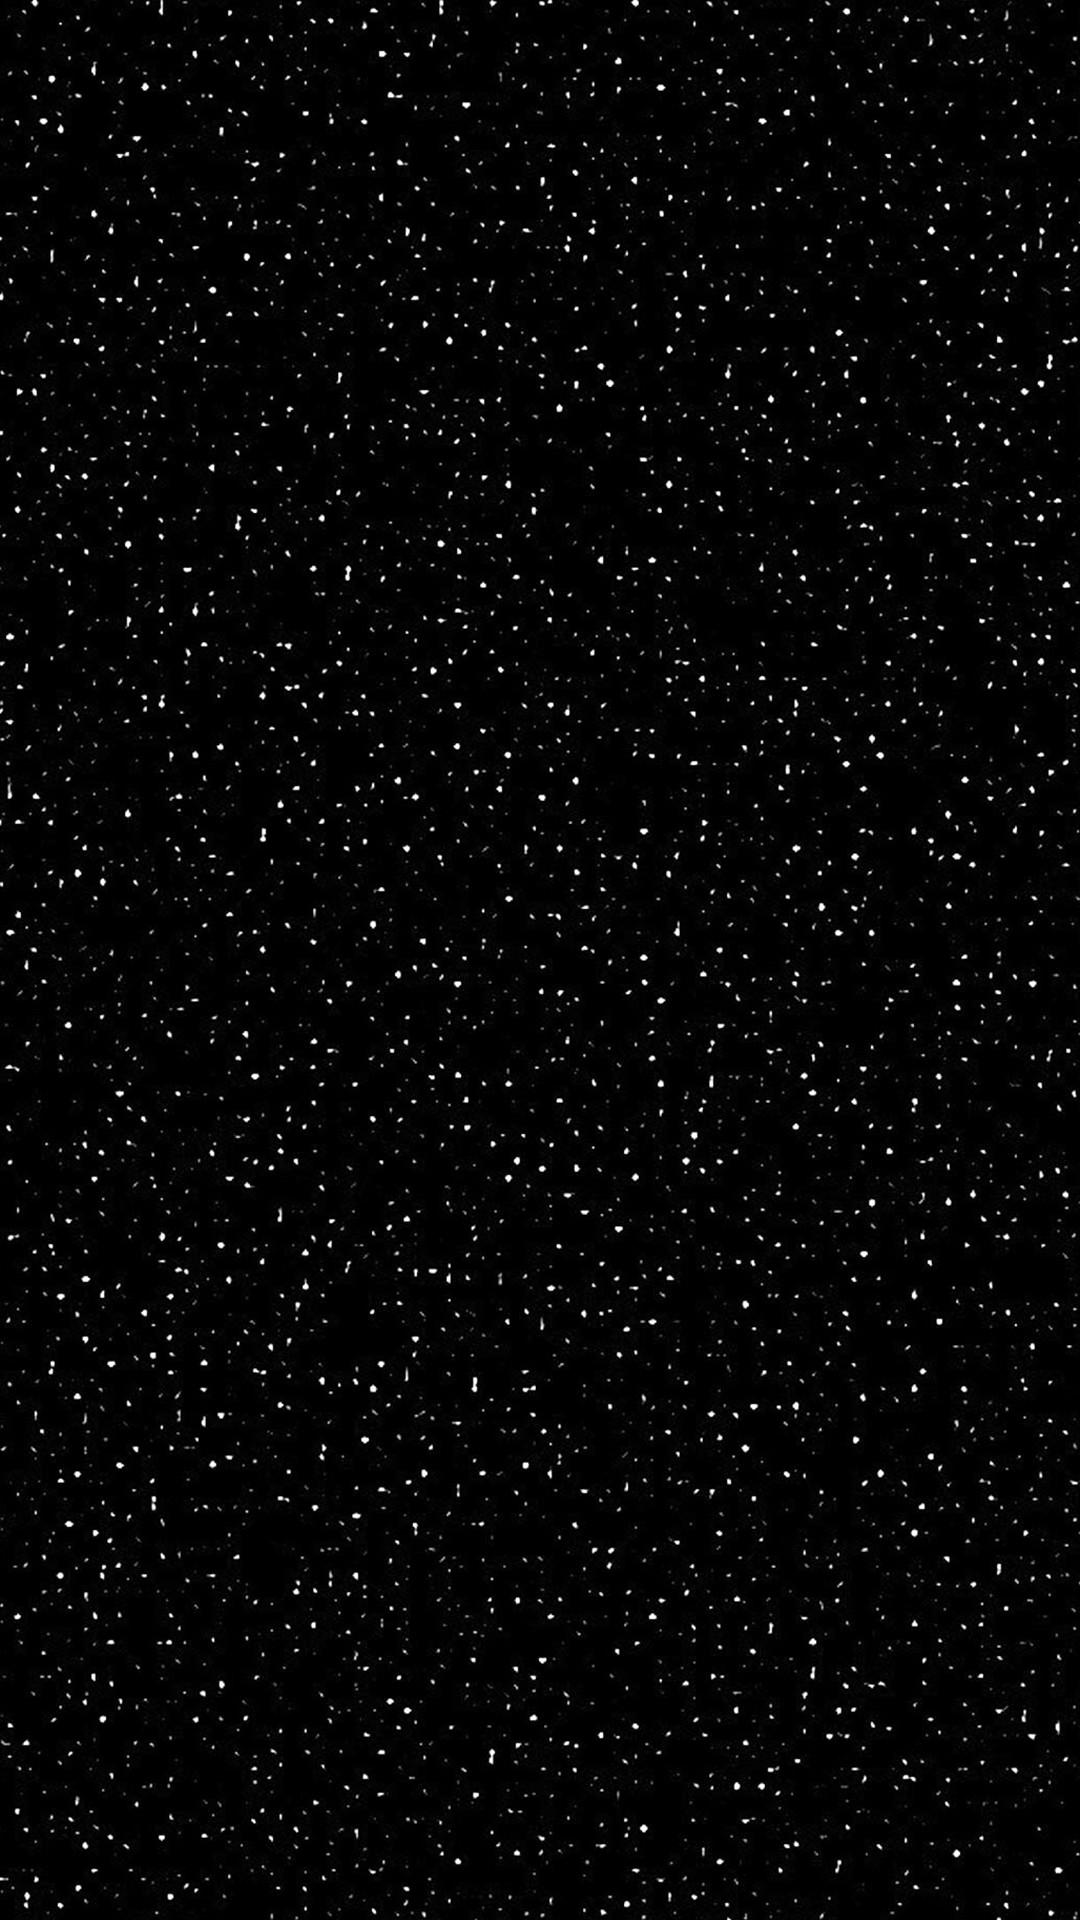 1920x1200 All Black Wallpaper Hd 11 Desktop